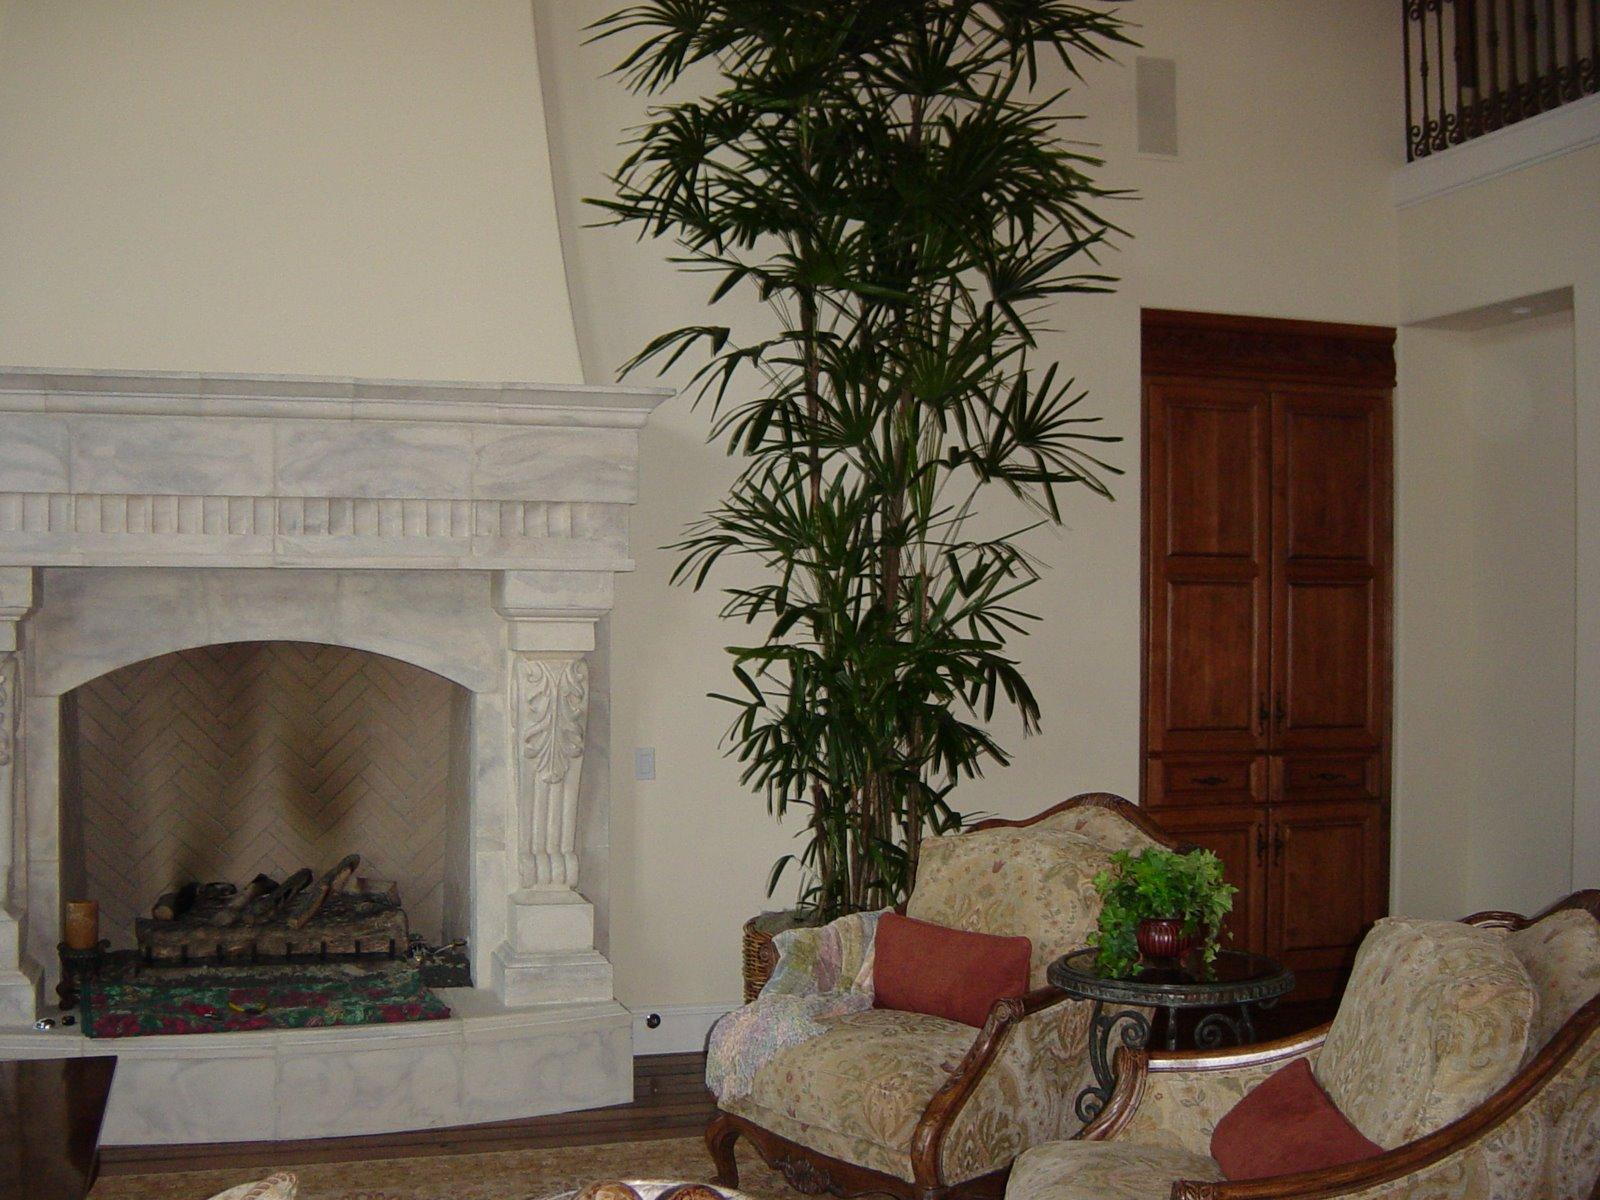 Fireplace Palm Estate image.JPG